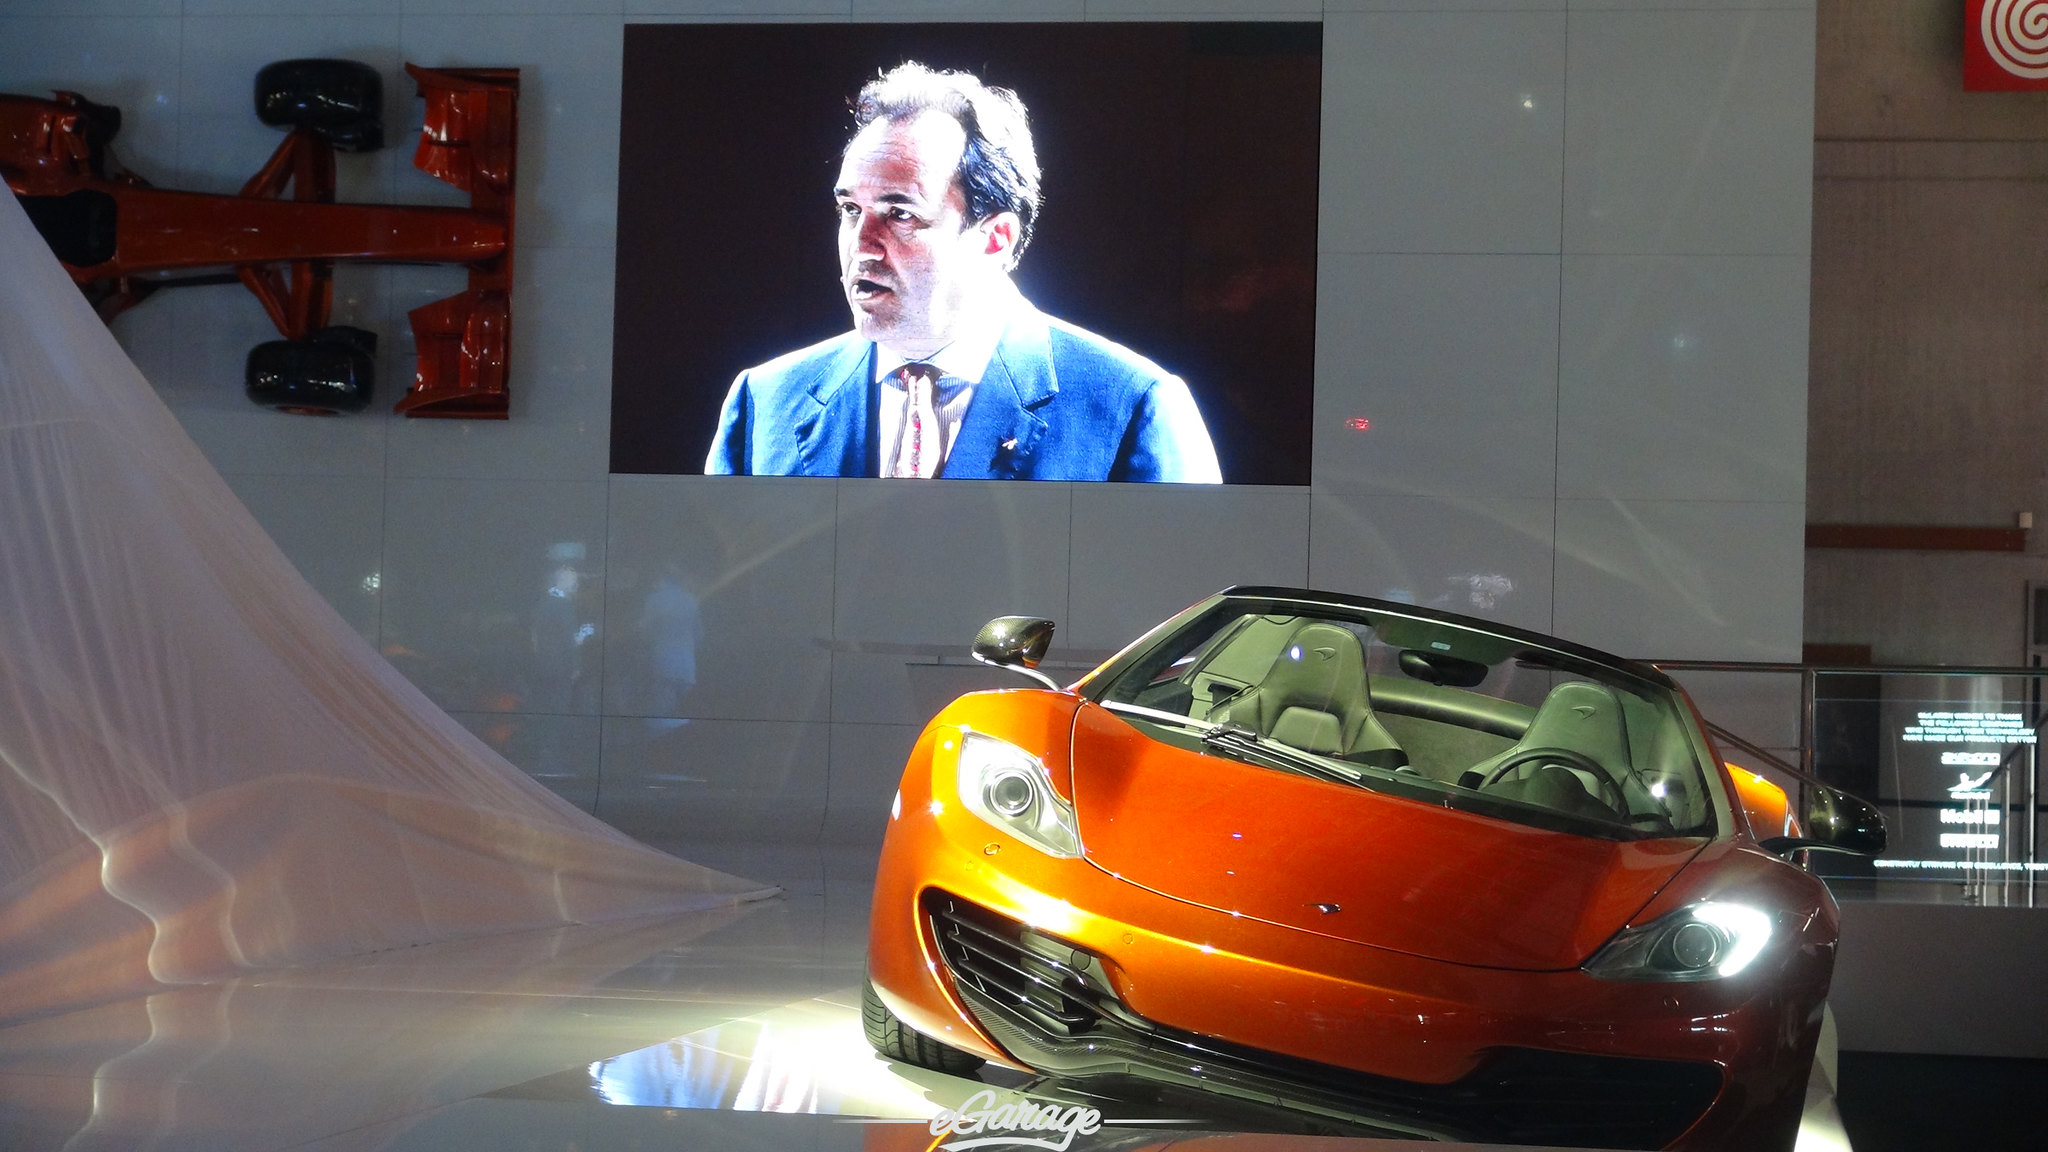 8030426973 b9f8439178 k 2012 Paris Motor Show